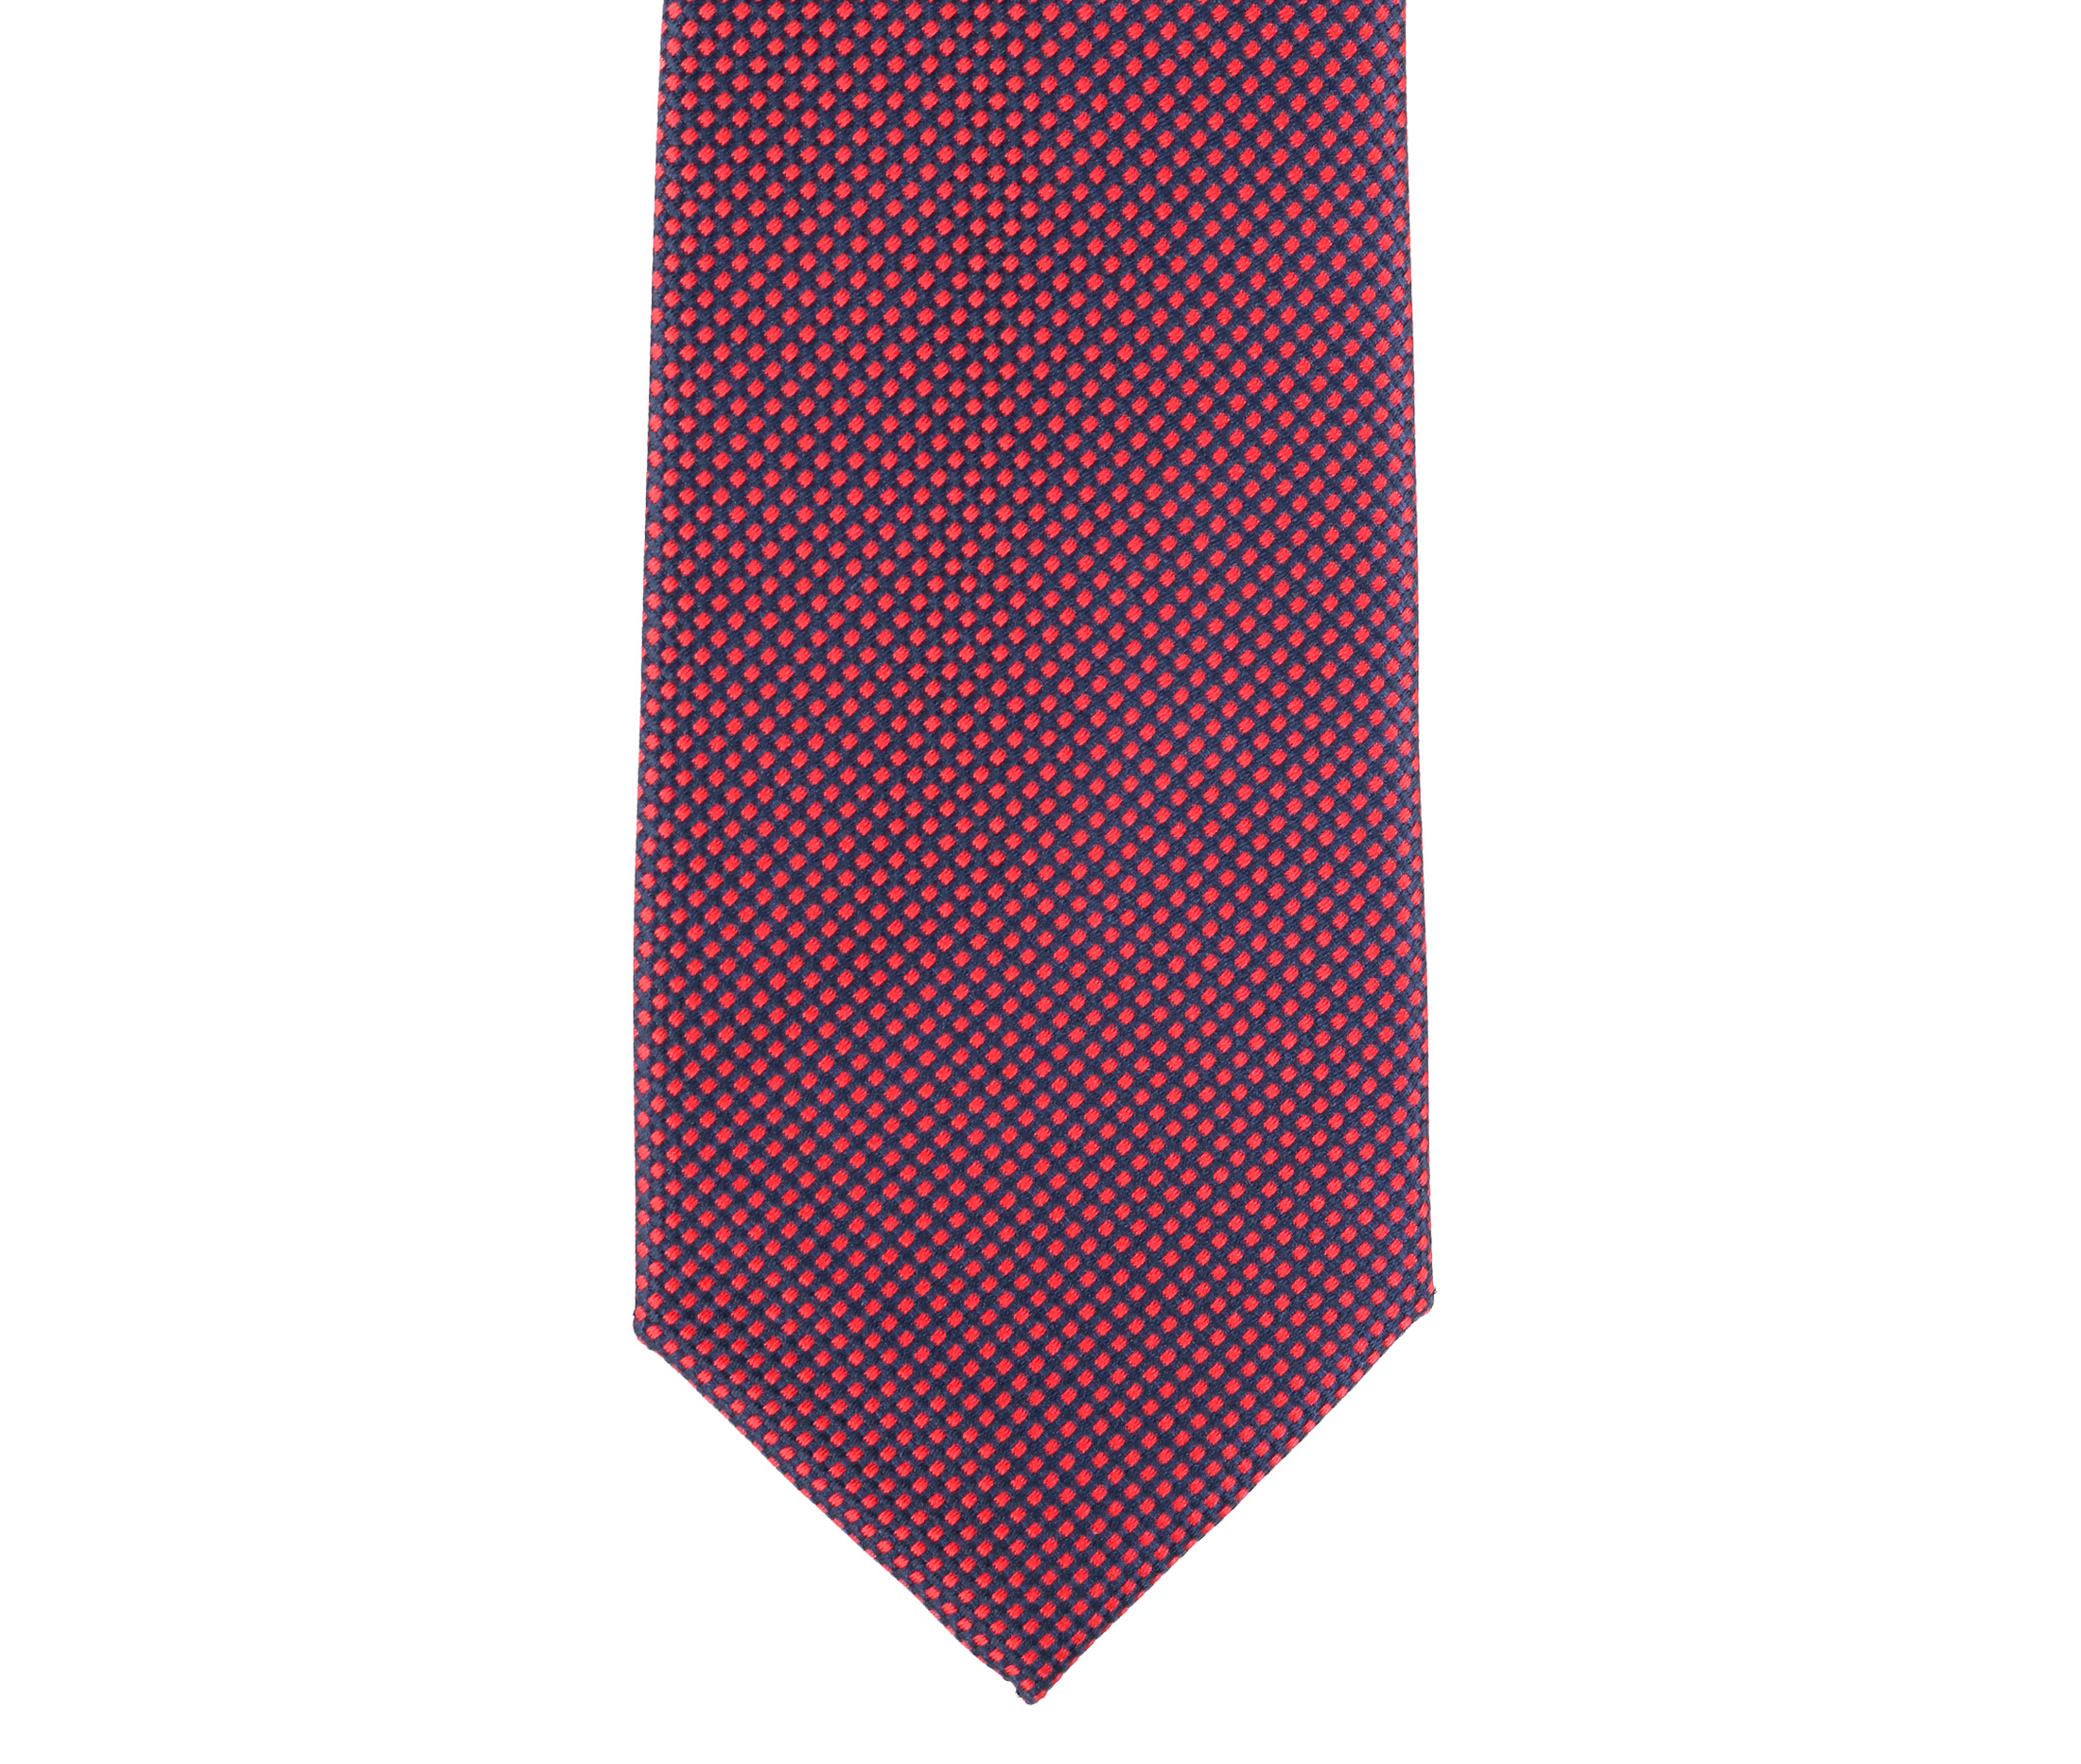 Krawatte Seide Karo Rot 9-17 foto 1